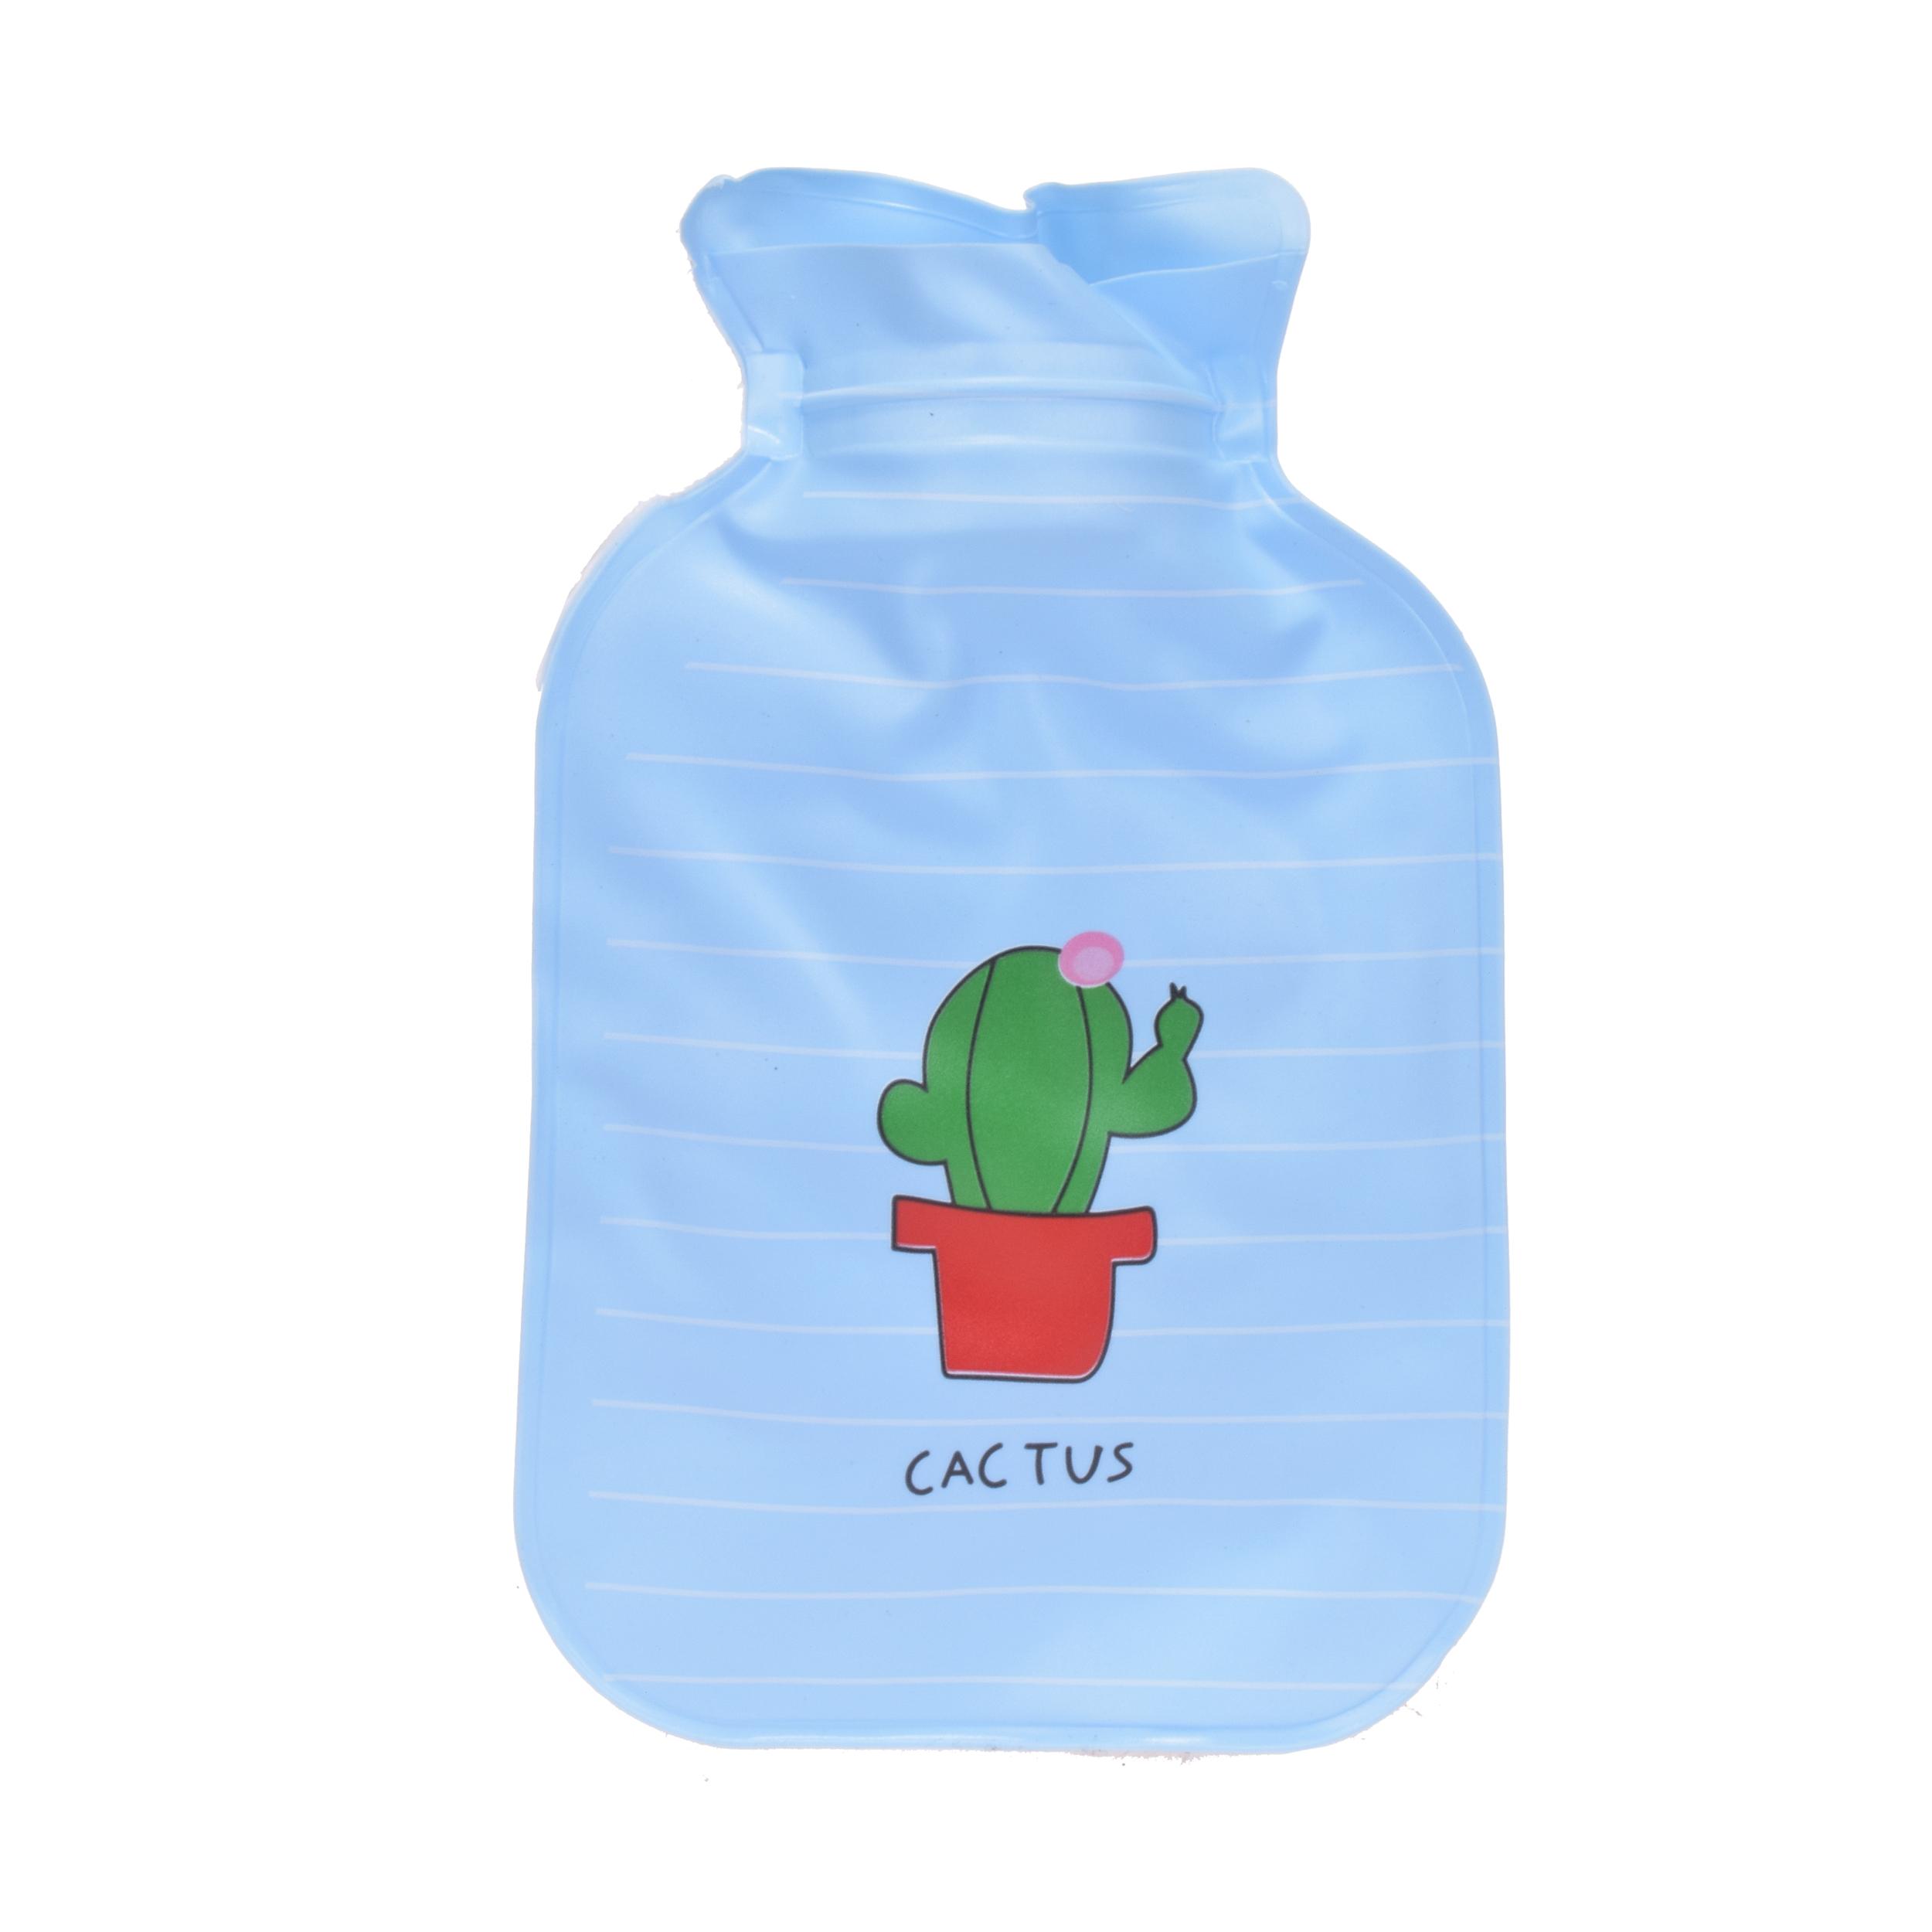 کیسه آب گرم کودک مدل CACTUS